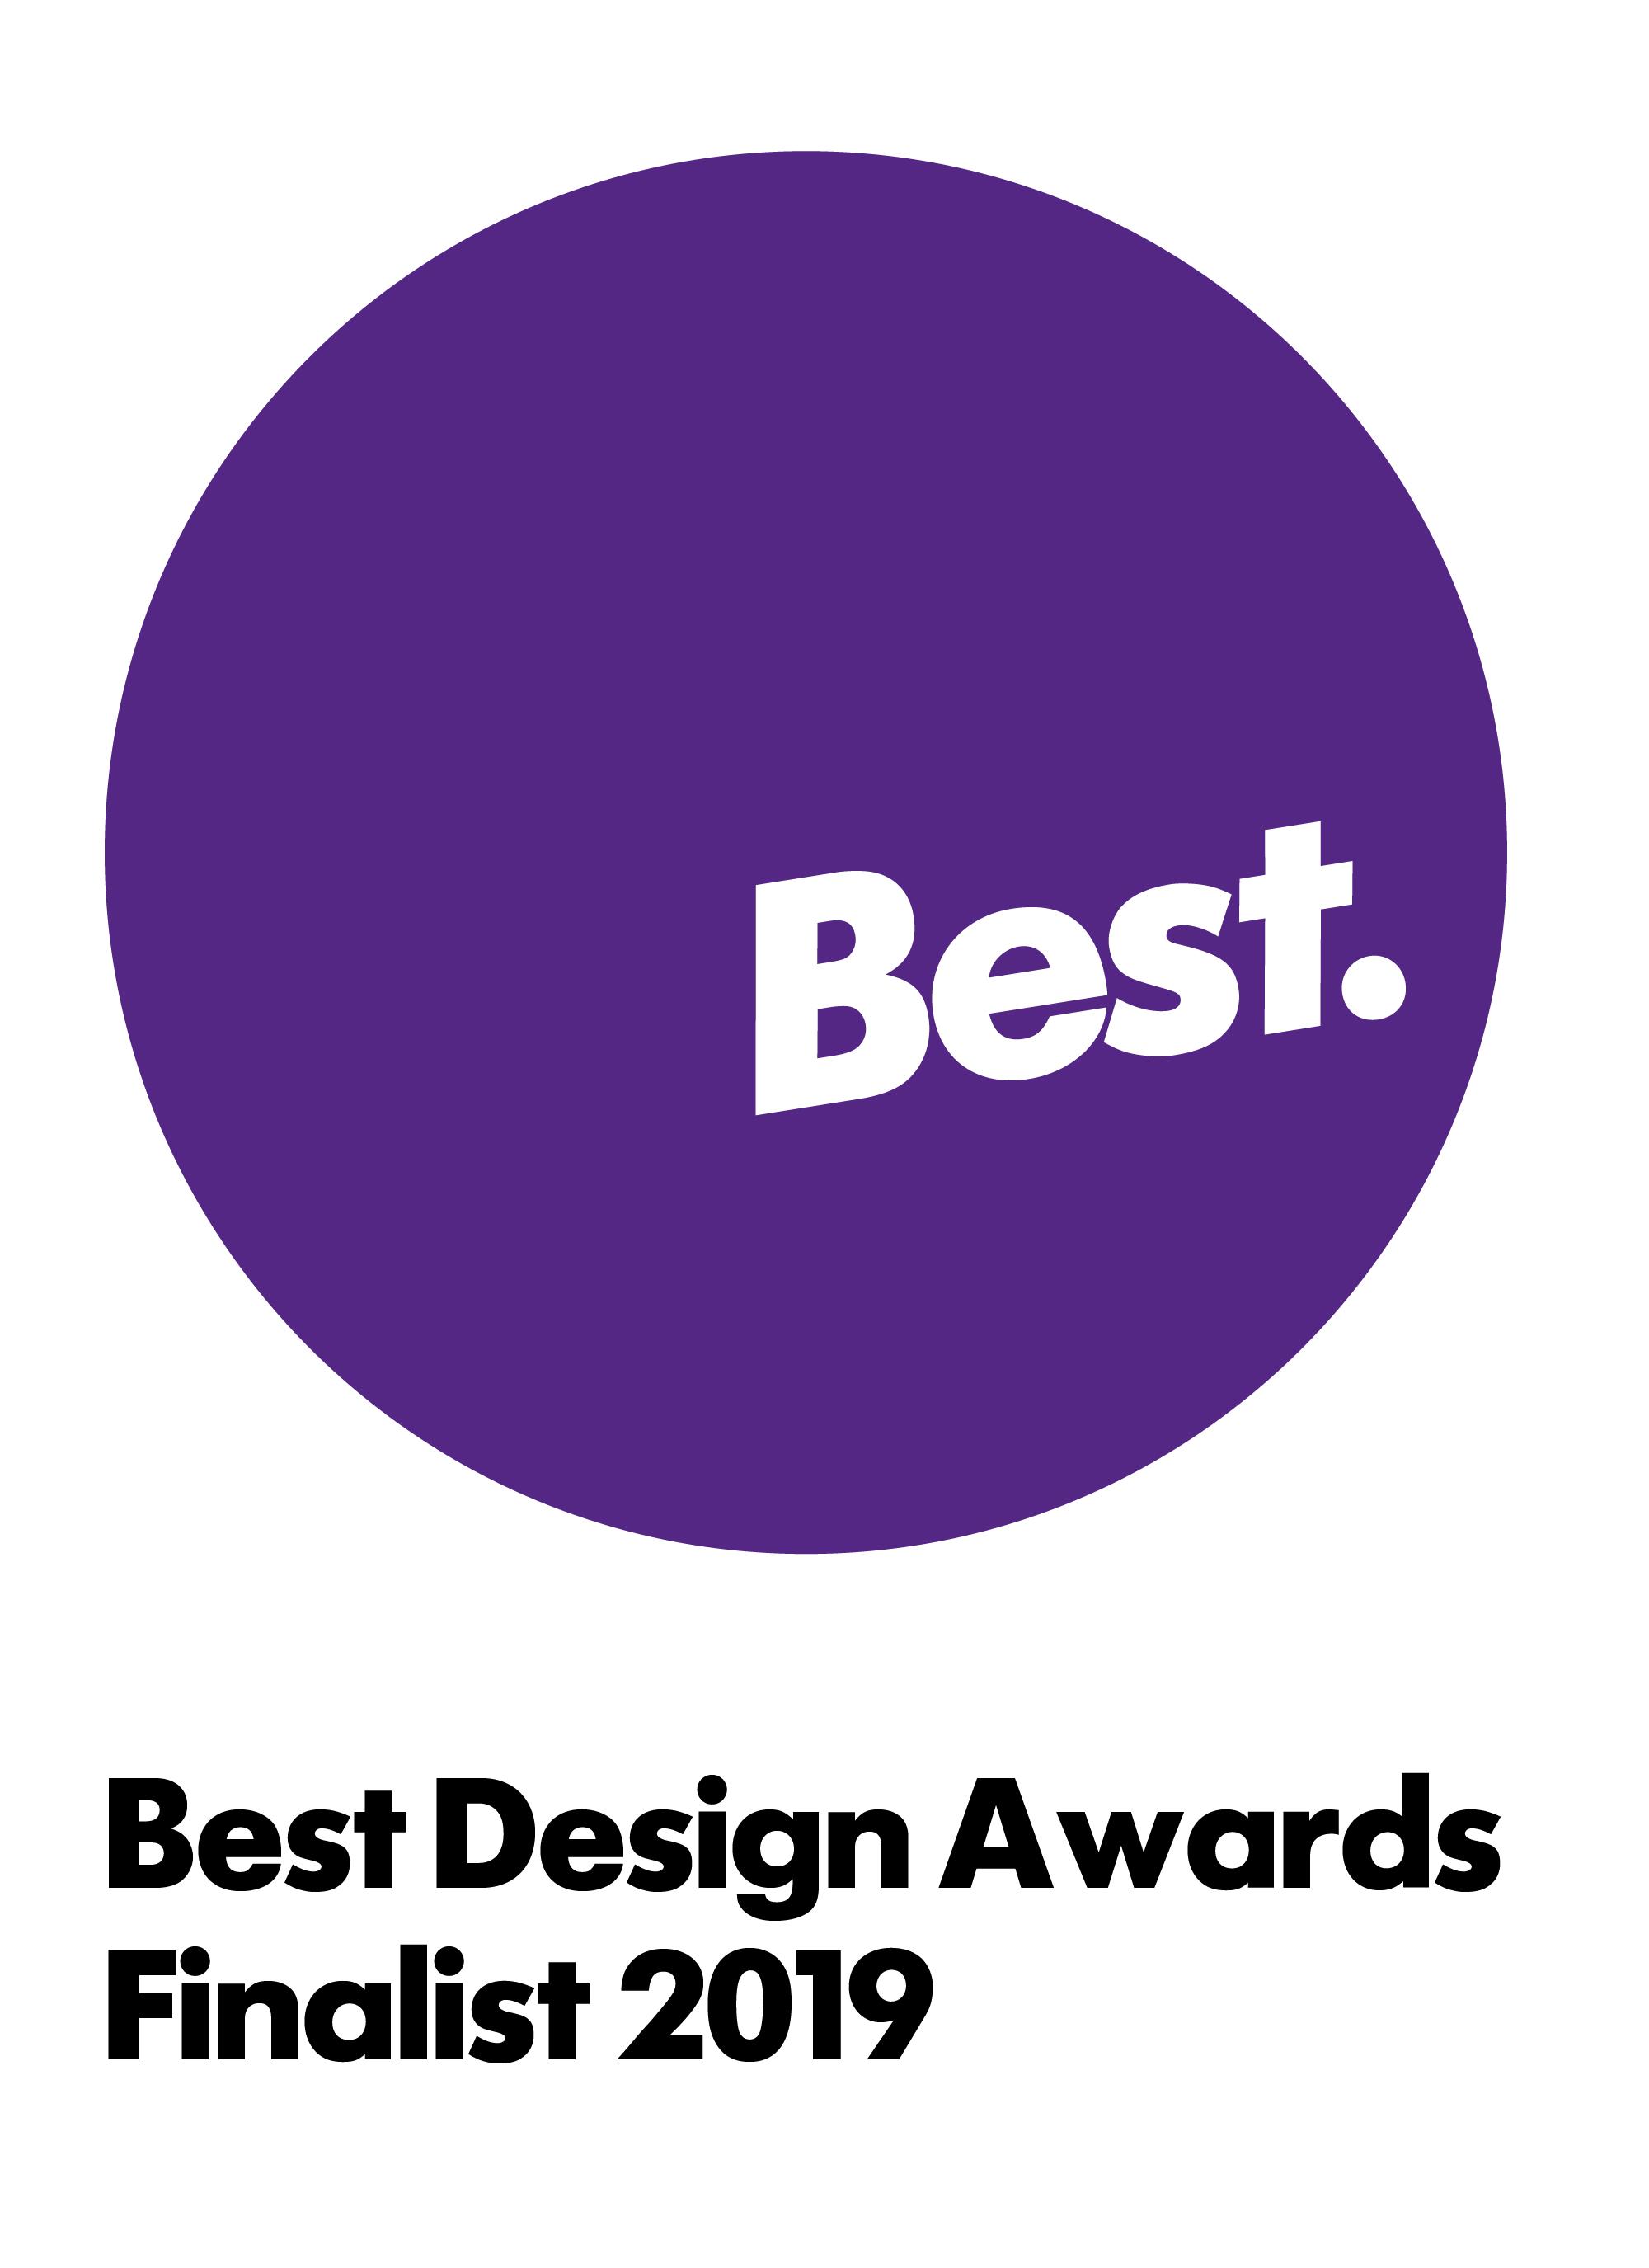 Best Template 2019 - Finalist Badge.jpg